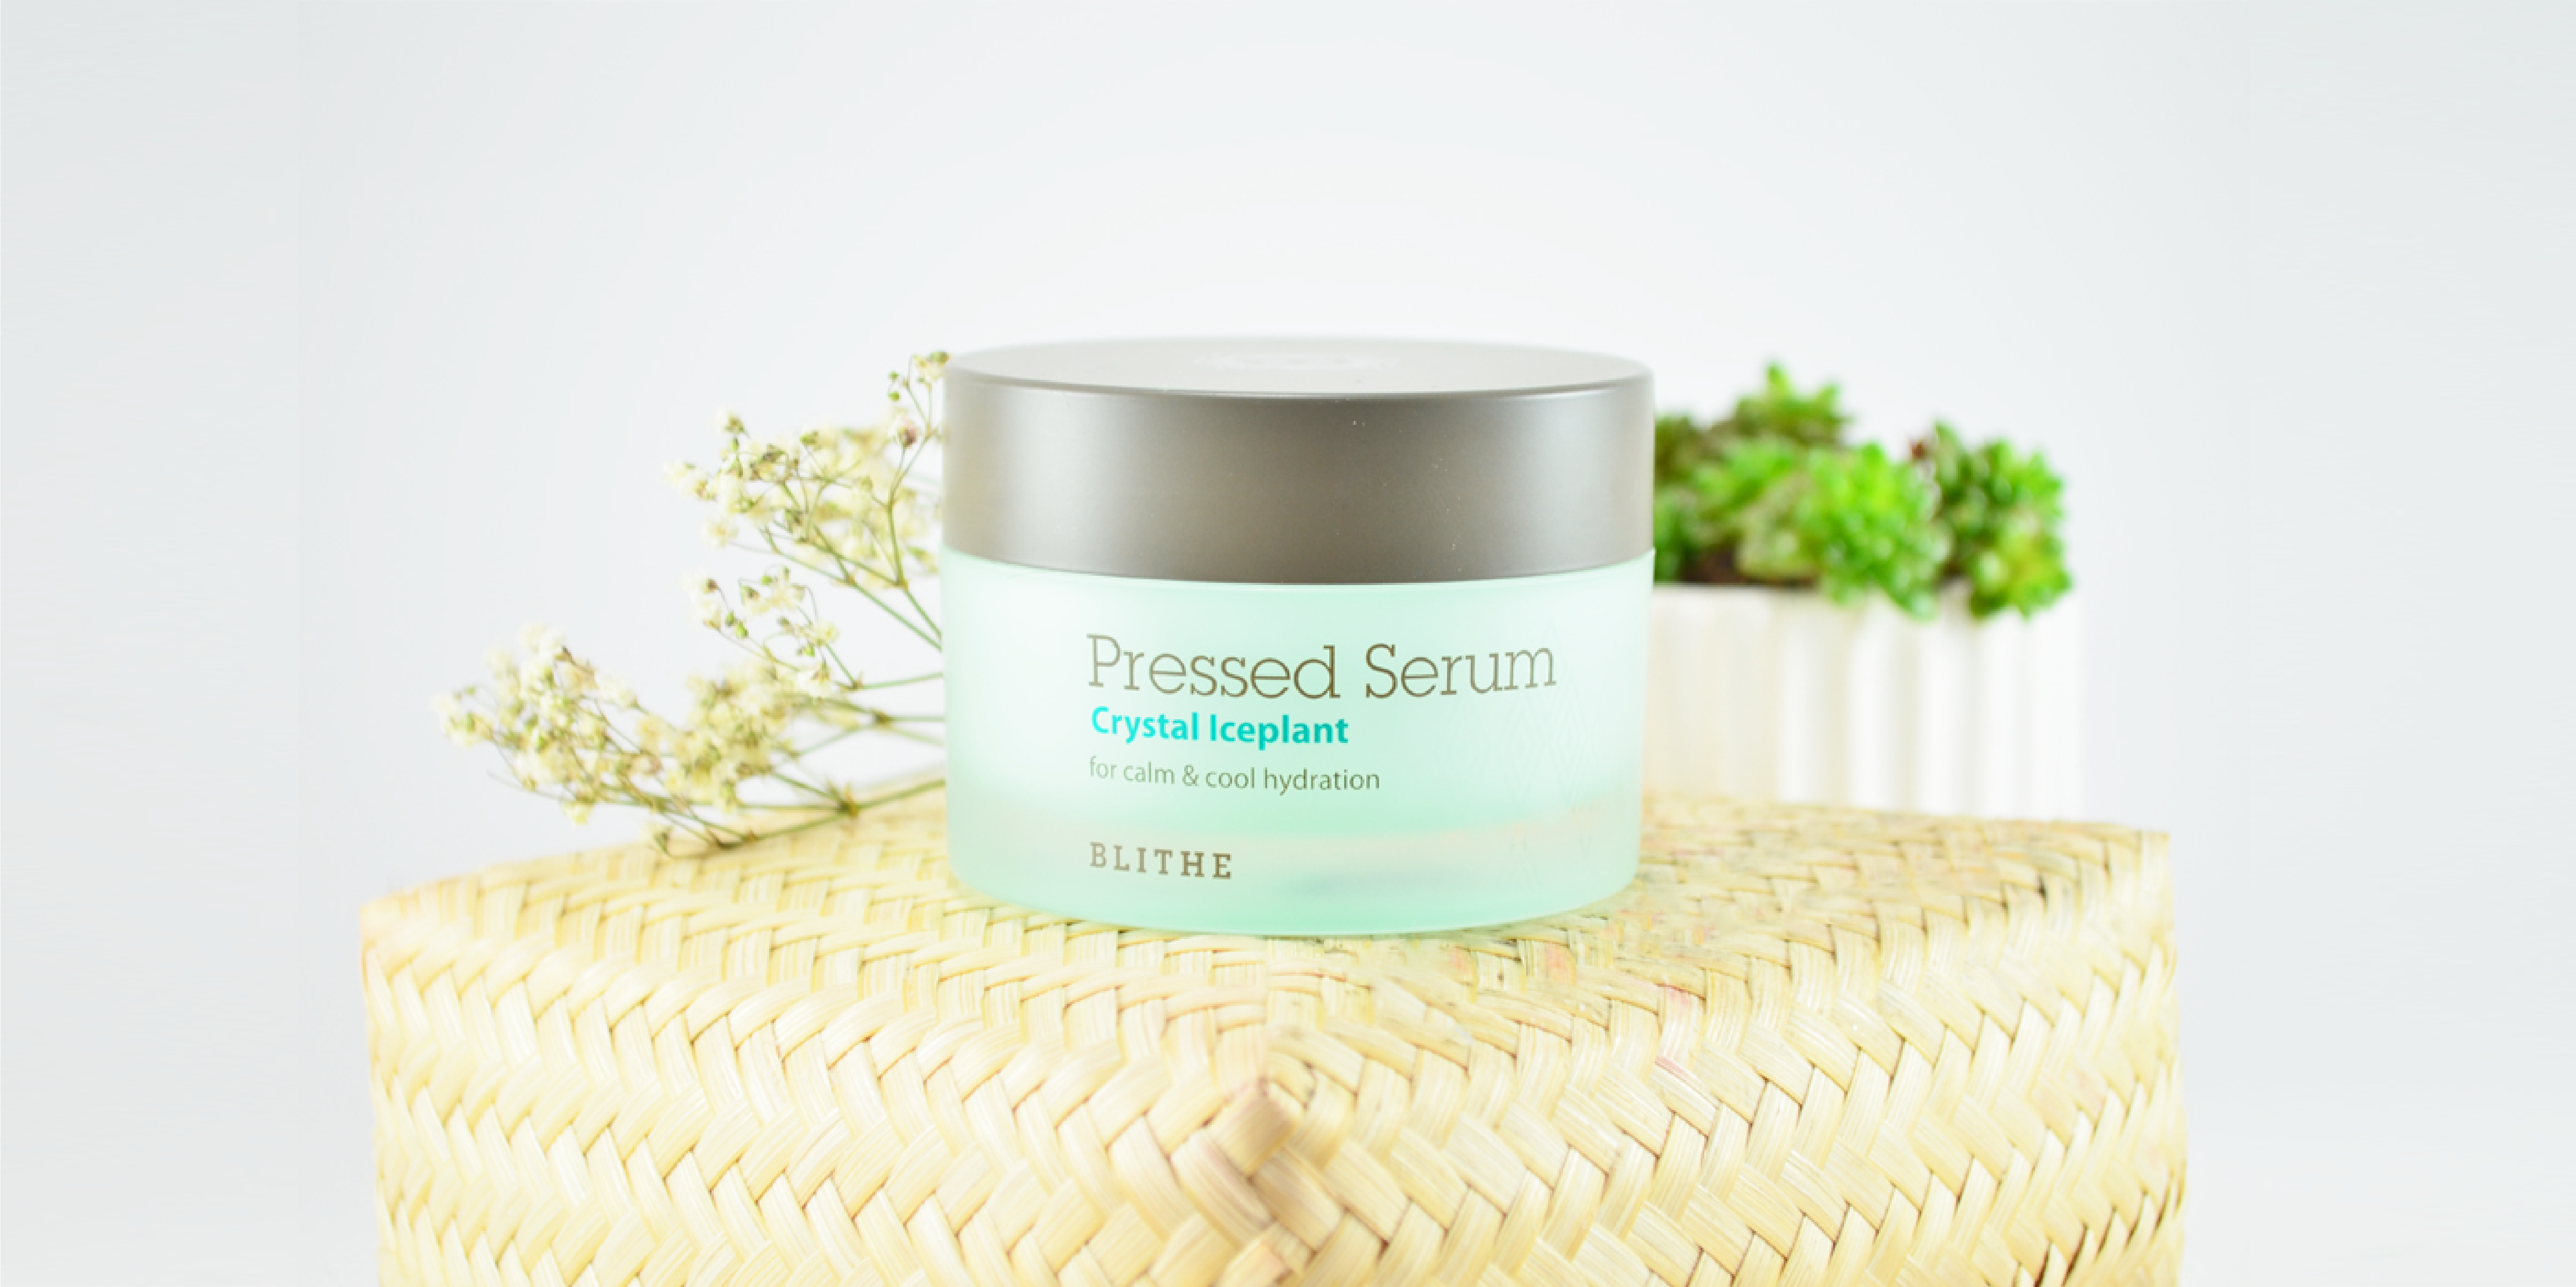 blithe-pressed-serum-crystal-iceplant-review-avis-blog